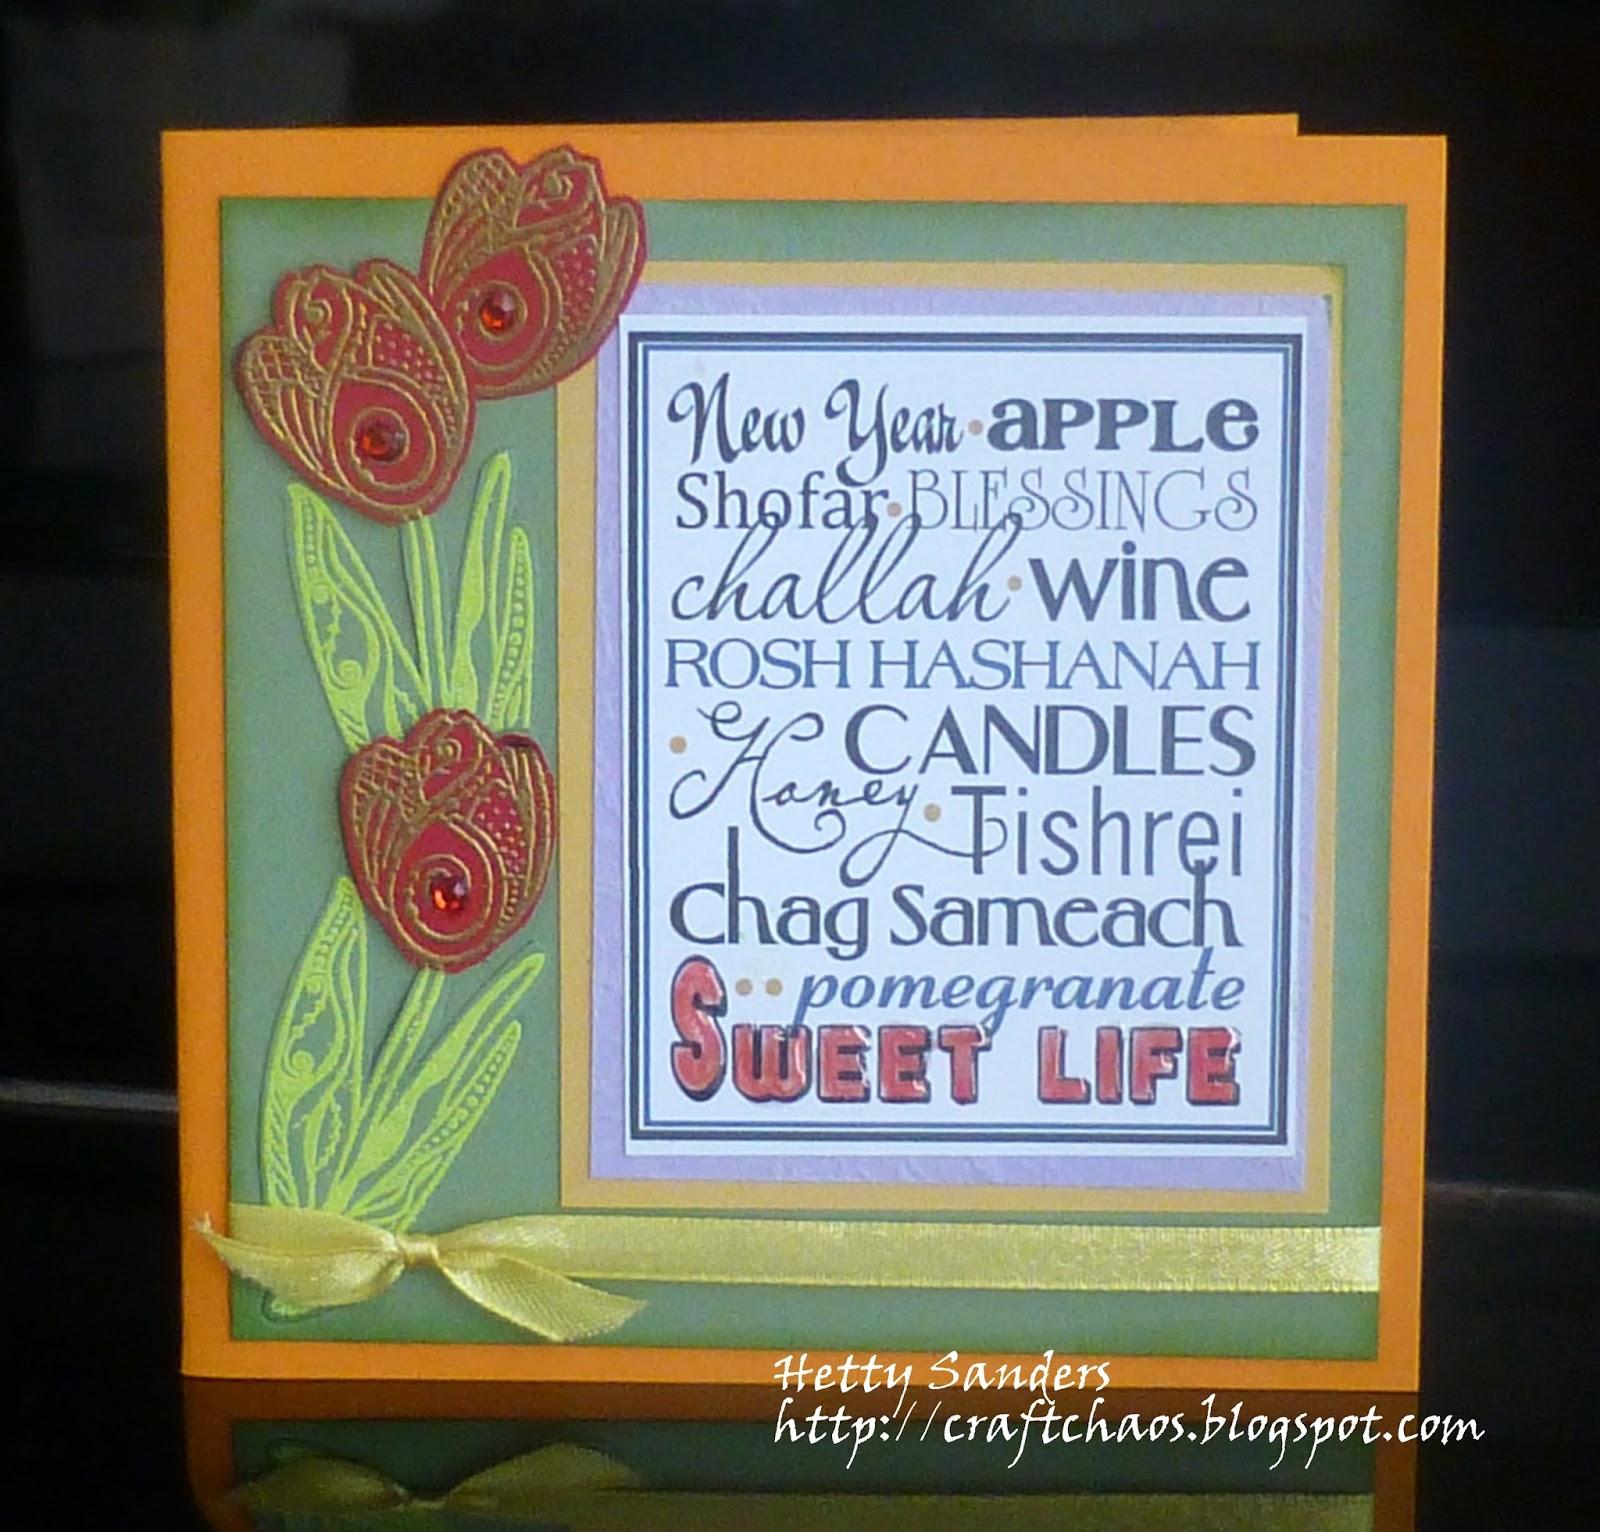 Craftchaos Saturday Card For Rosh Hashanah